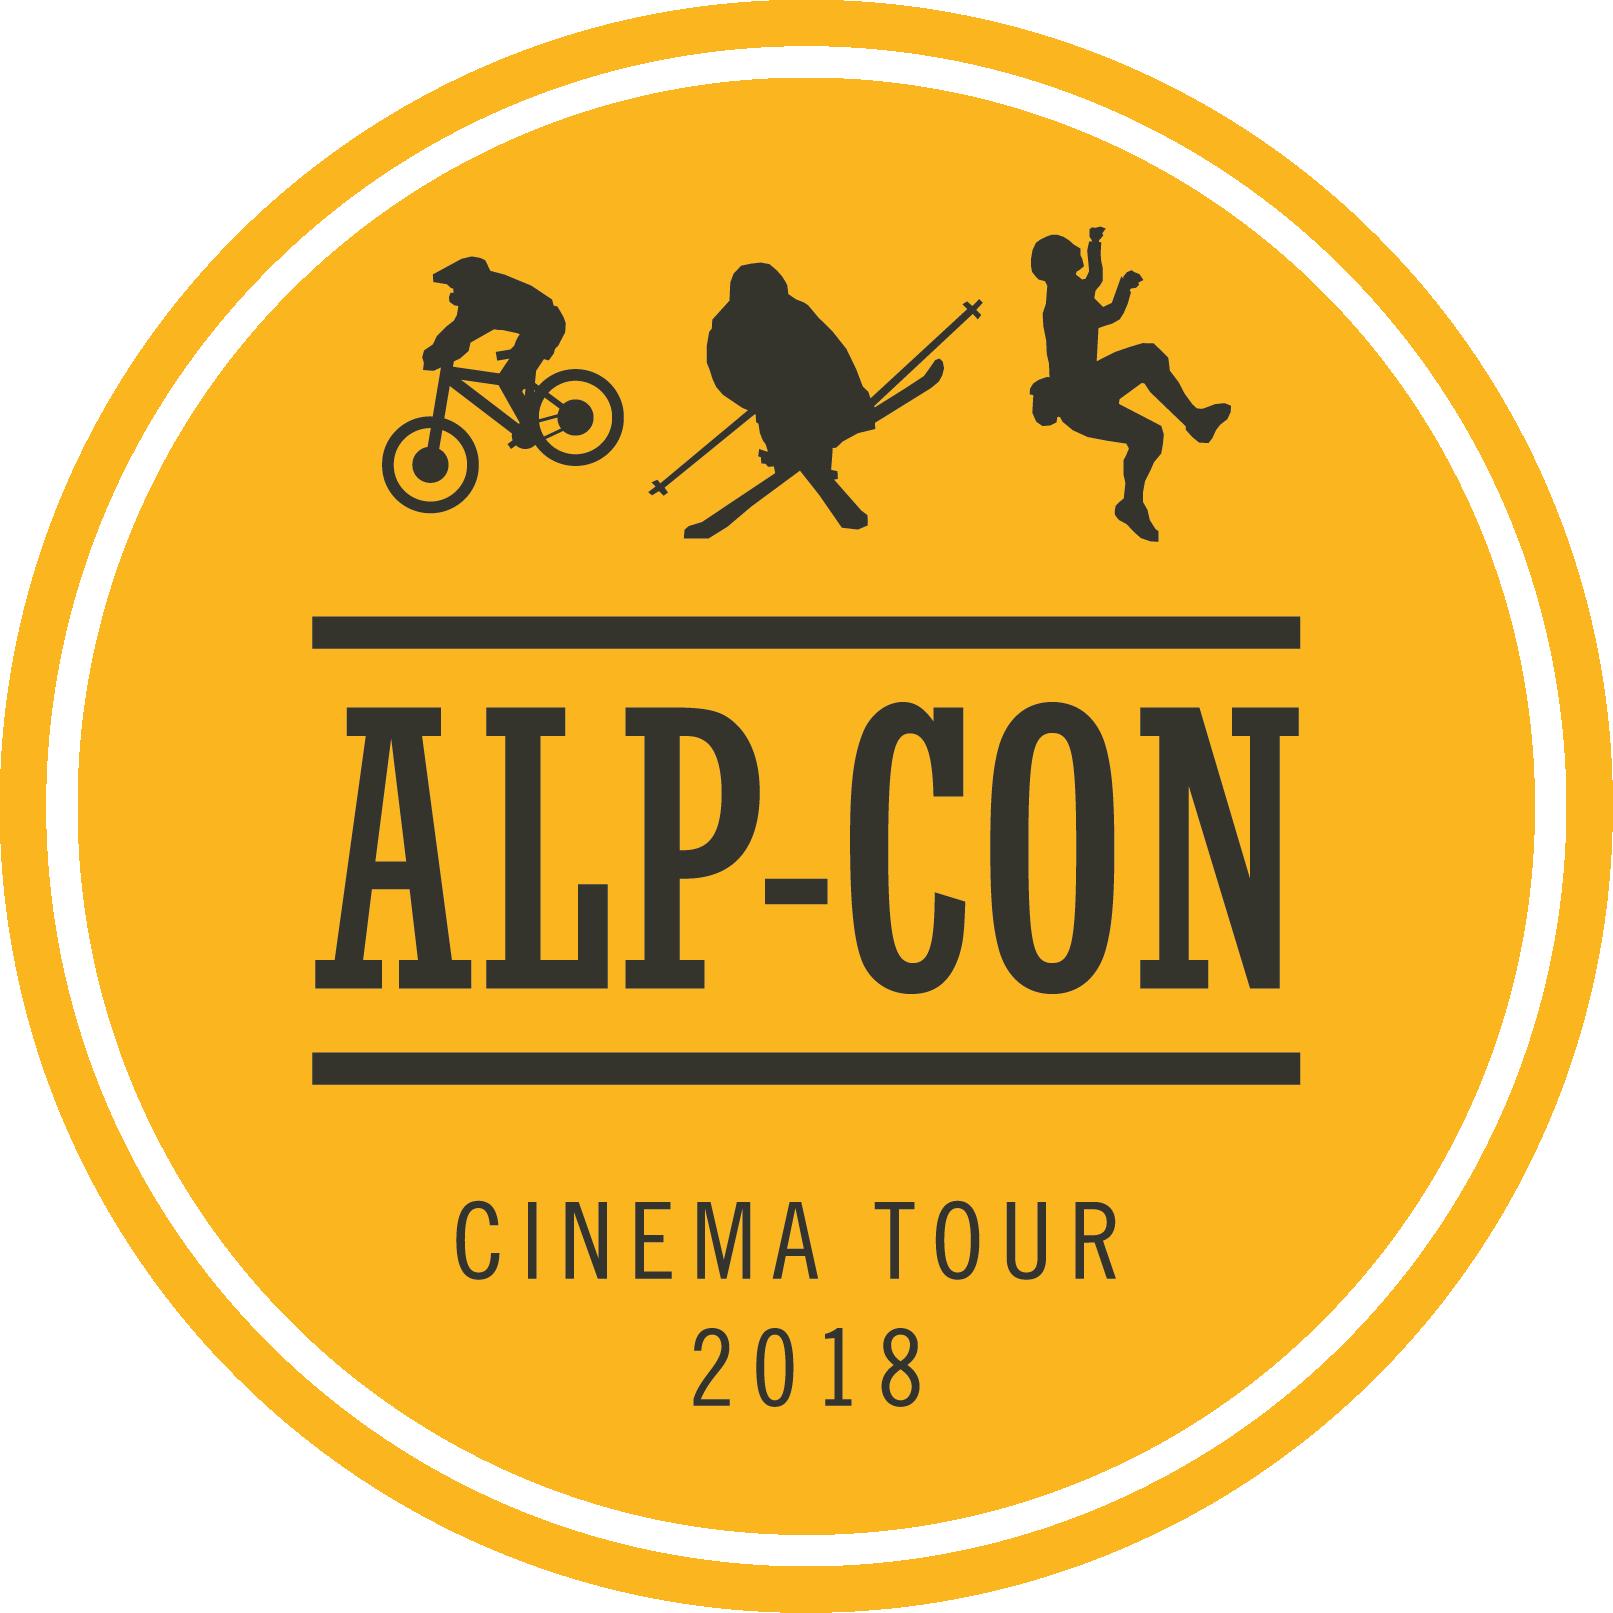 Alp-Con Cinema Tour 2018